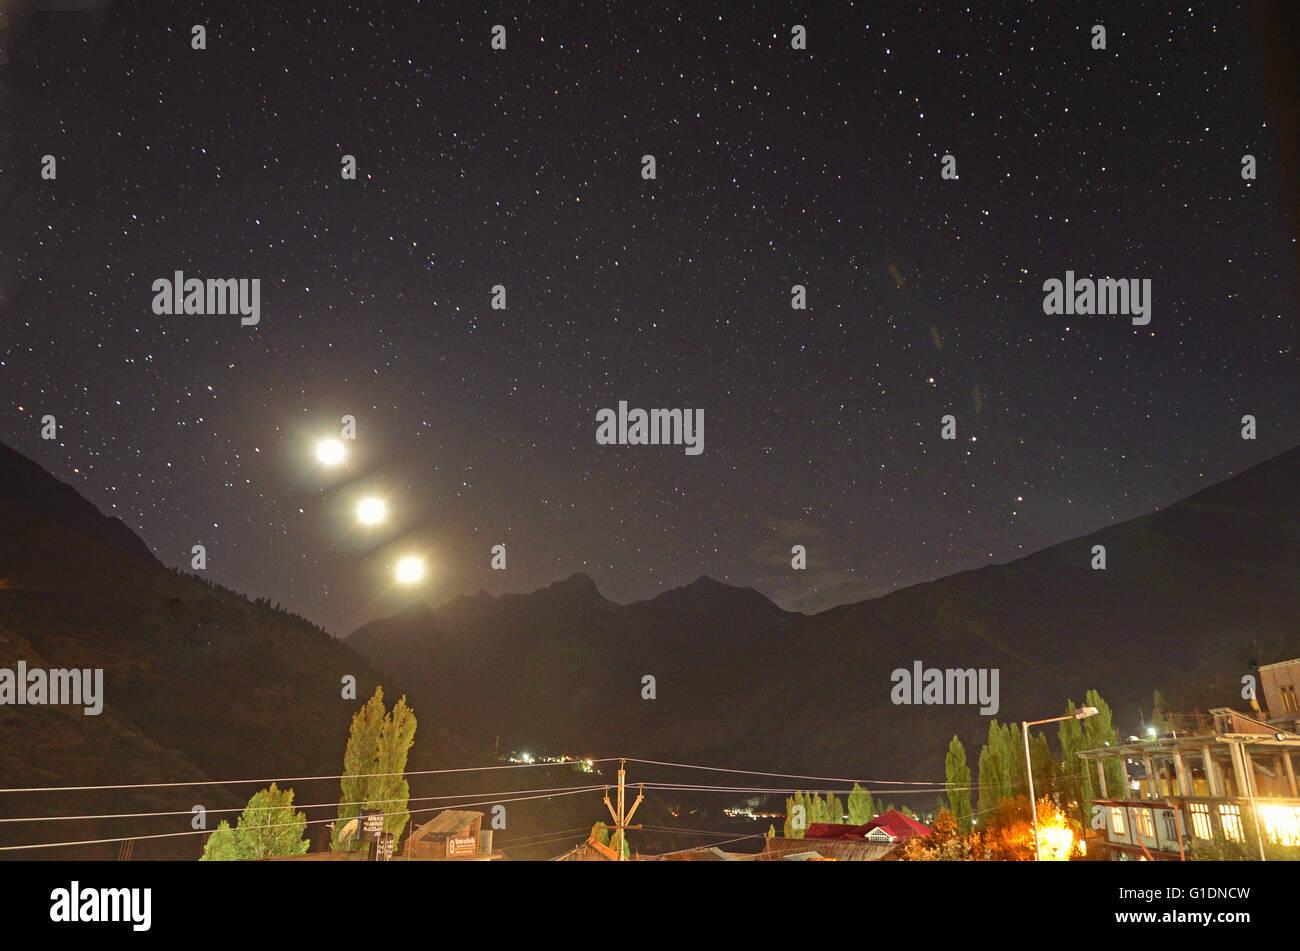 Moon sets over the Himalayan ranges, view from Keylong, Lahaul, Himachal Pradesh, India - Stock Image